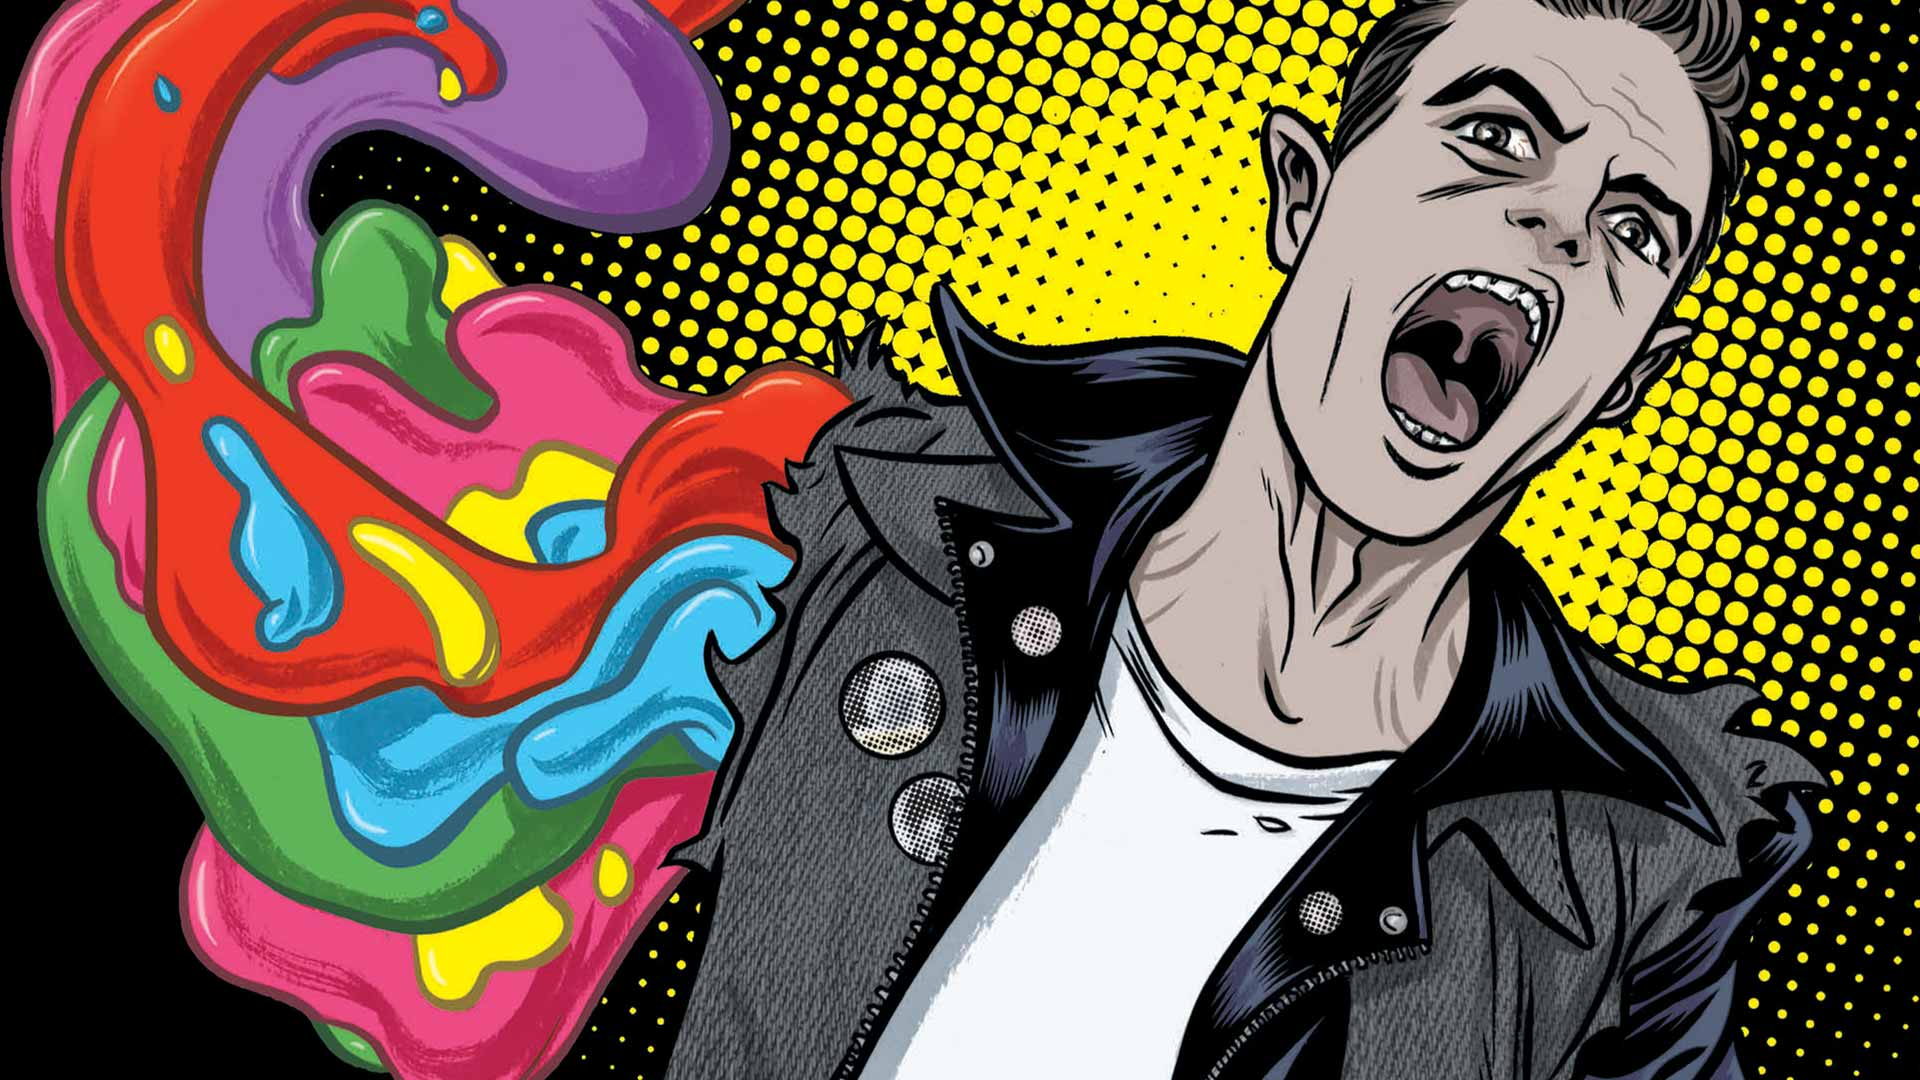 Punk Rock + Astro City = Excellent Vertigo Week